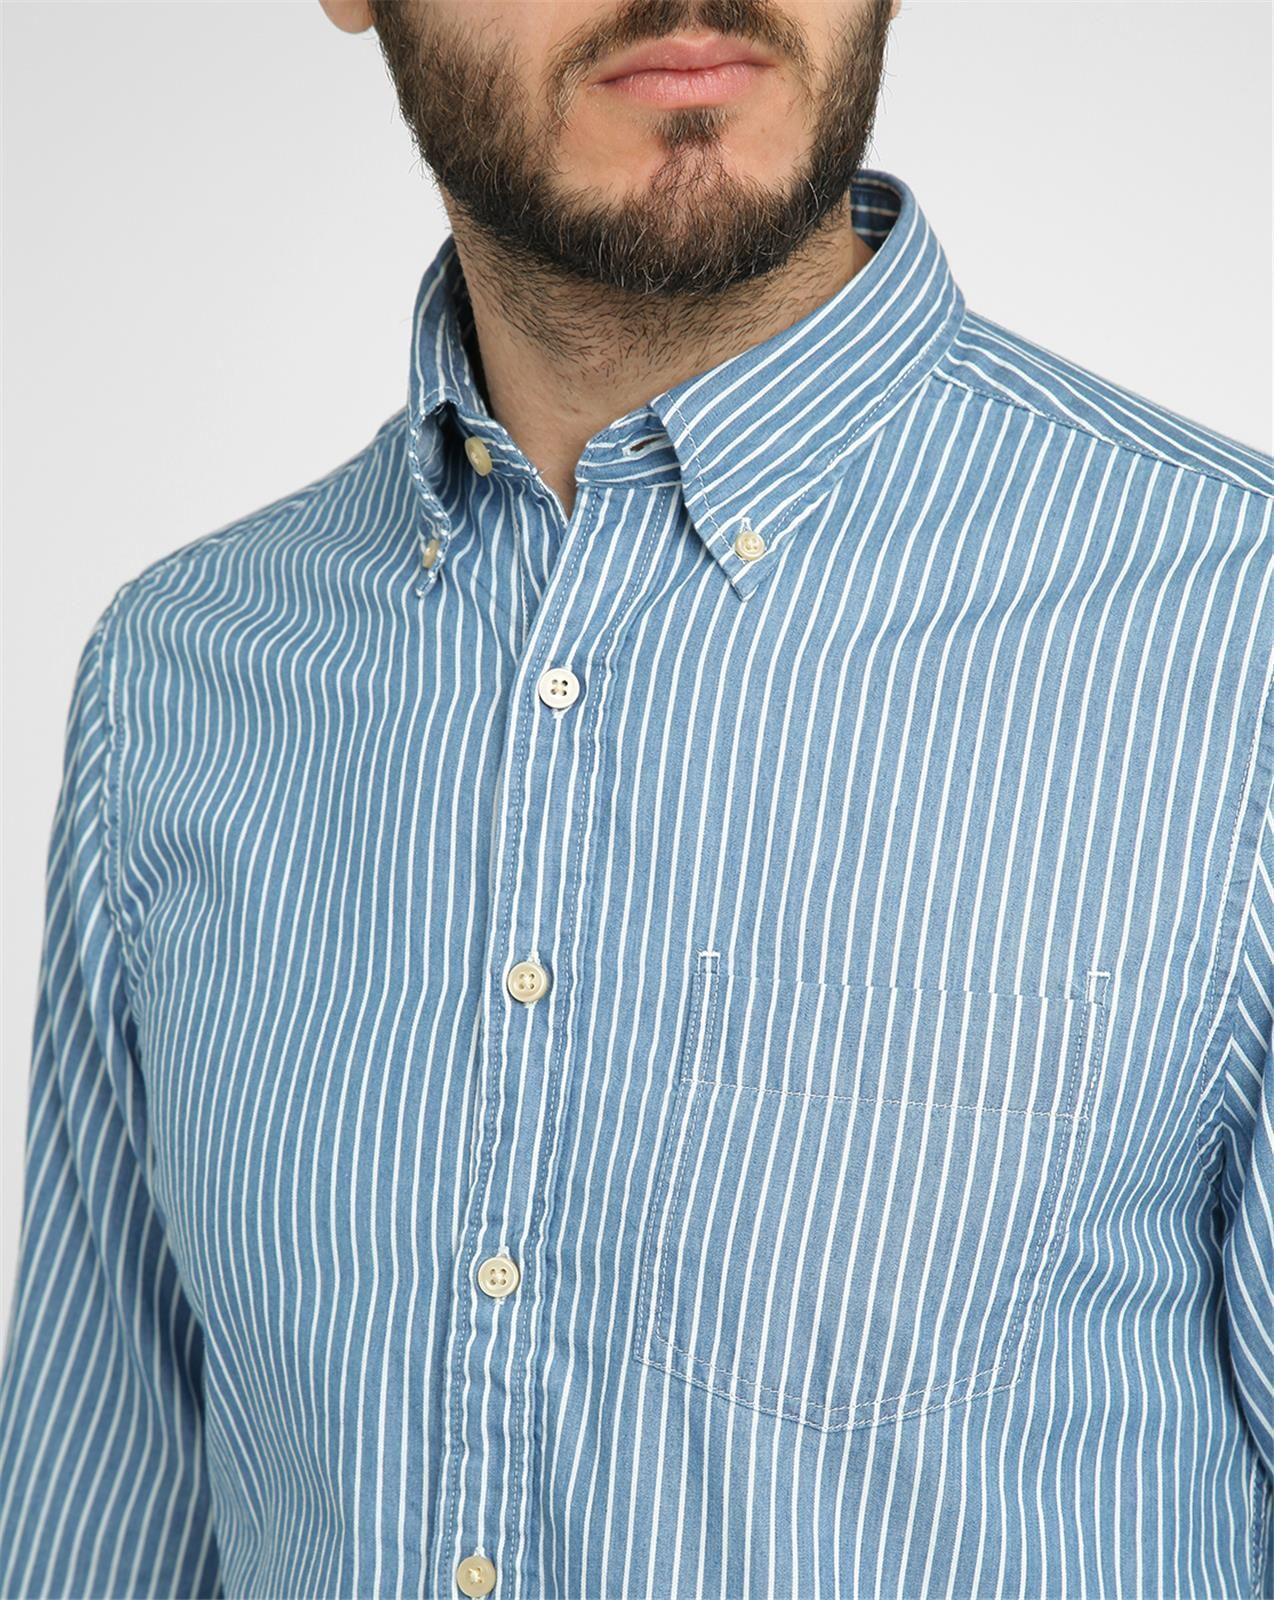 gant-indigo-indigo-striped-button-down-s